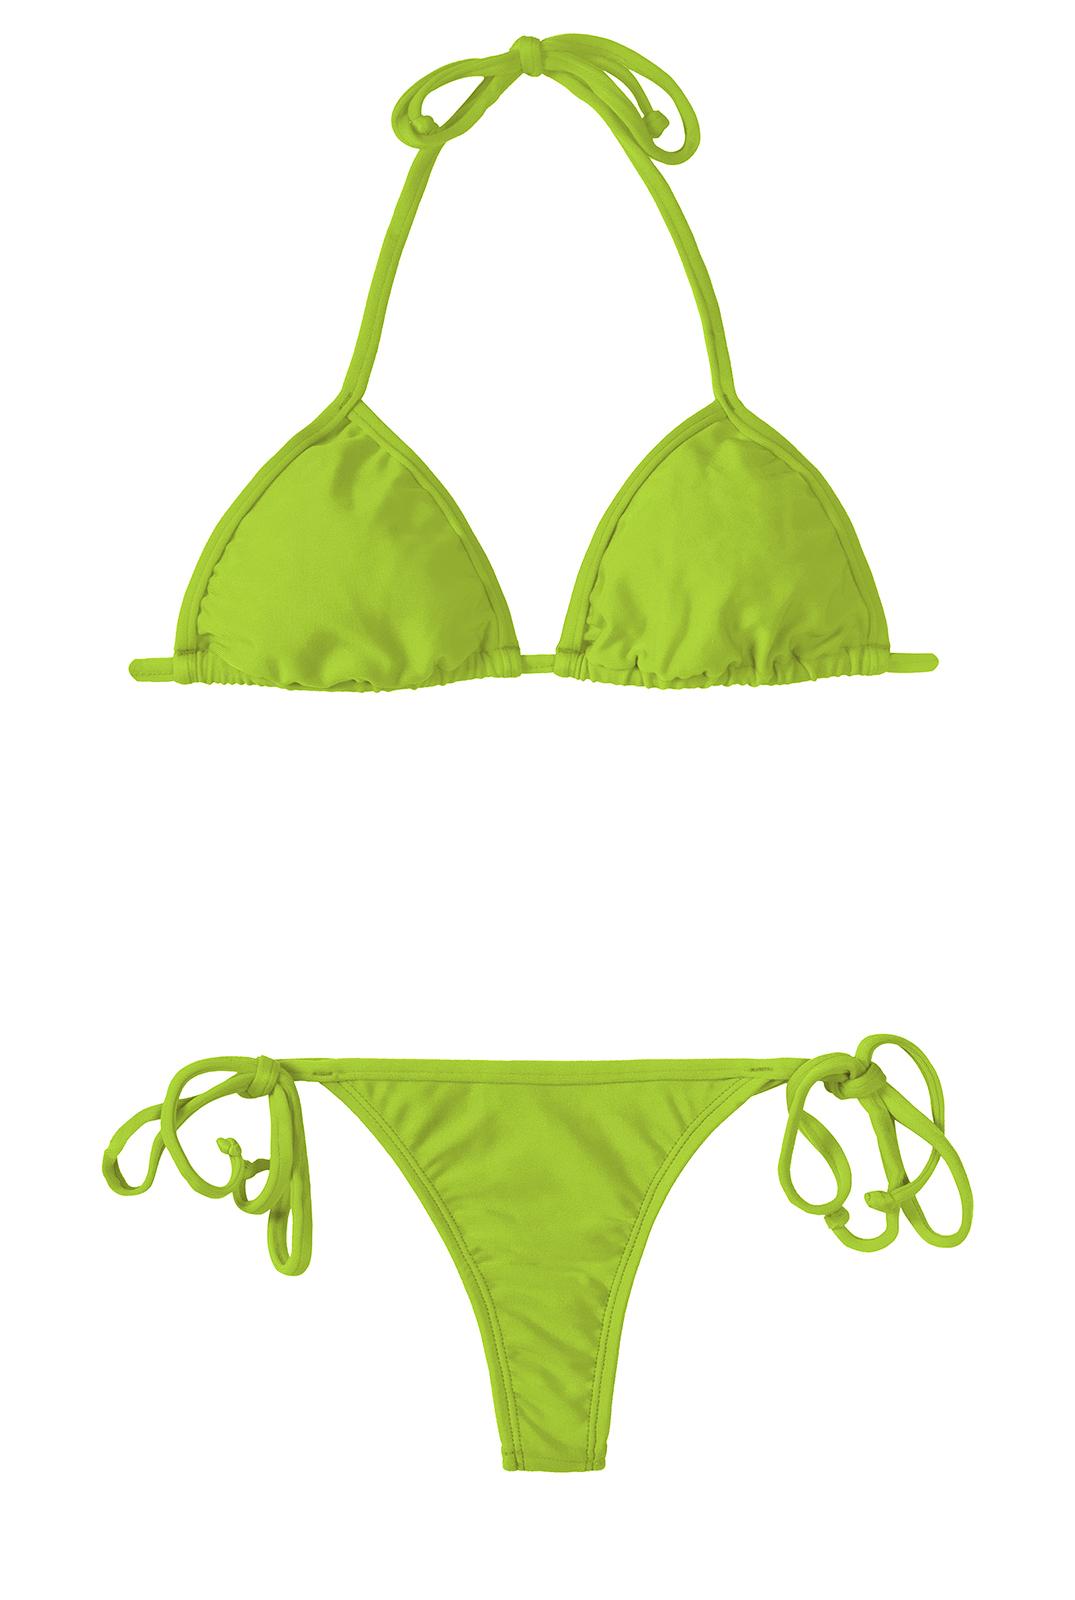 b5e52d49a6865 Bikini Bikini Perizoma Verde Mela E Top Scorrevole - Jureia Cort Micro